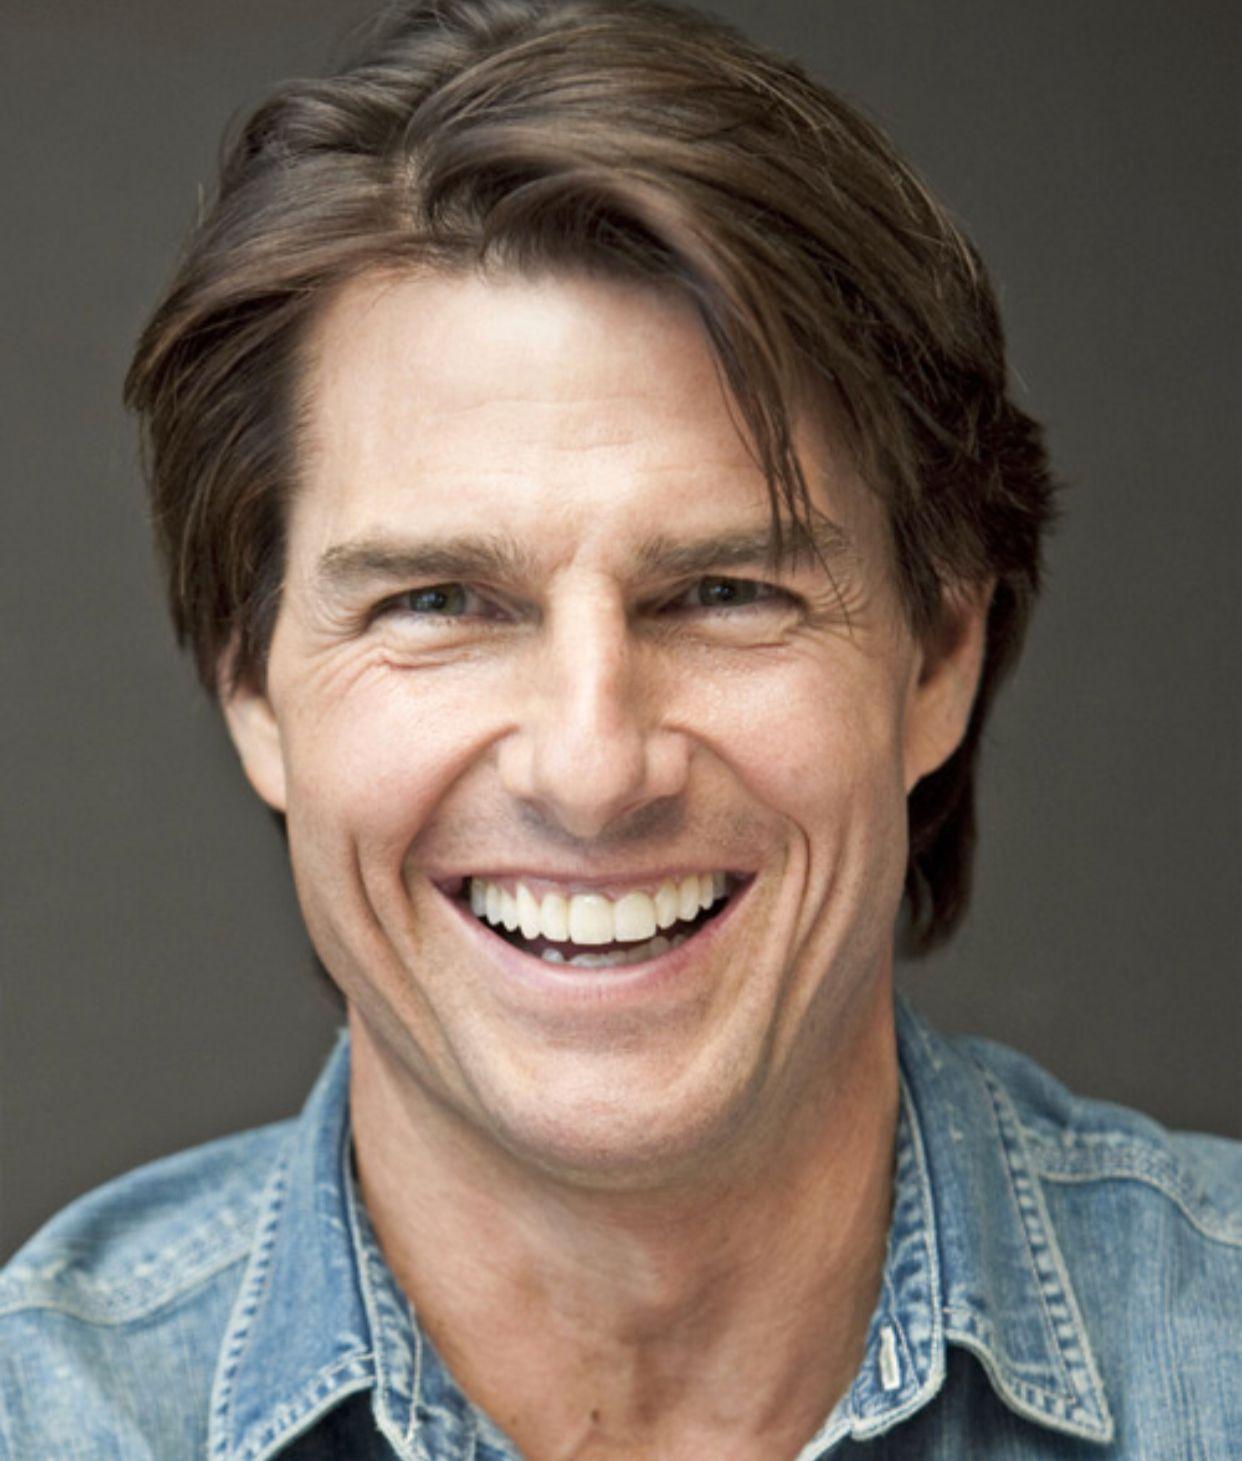 Tom Cruise Tom Cruise Haircut Tom Cruise Hair Tom Cruise Teeth